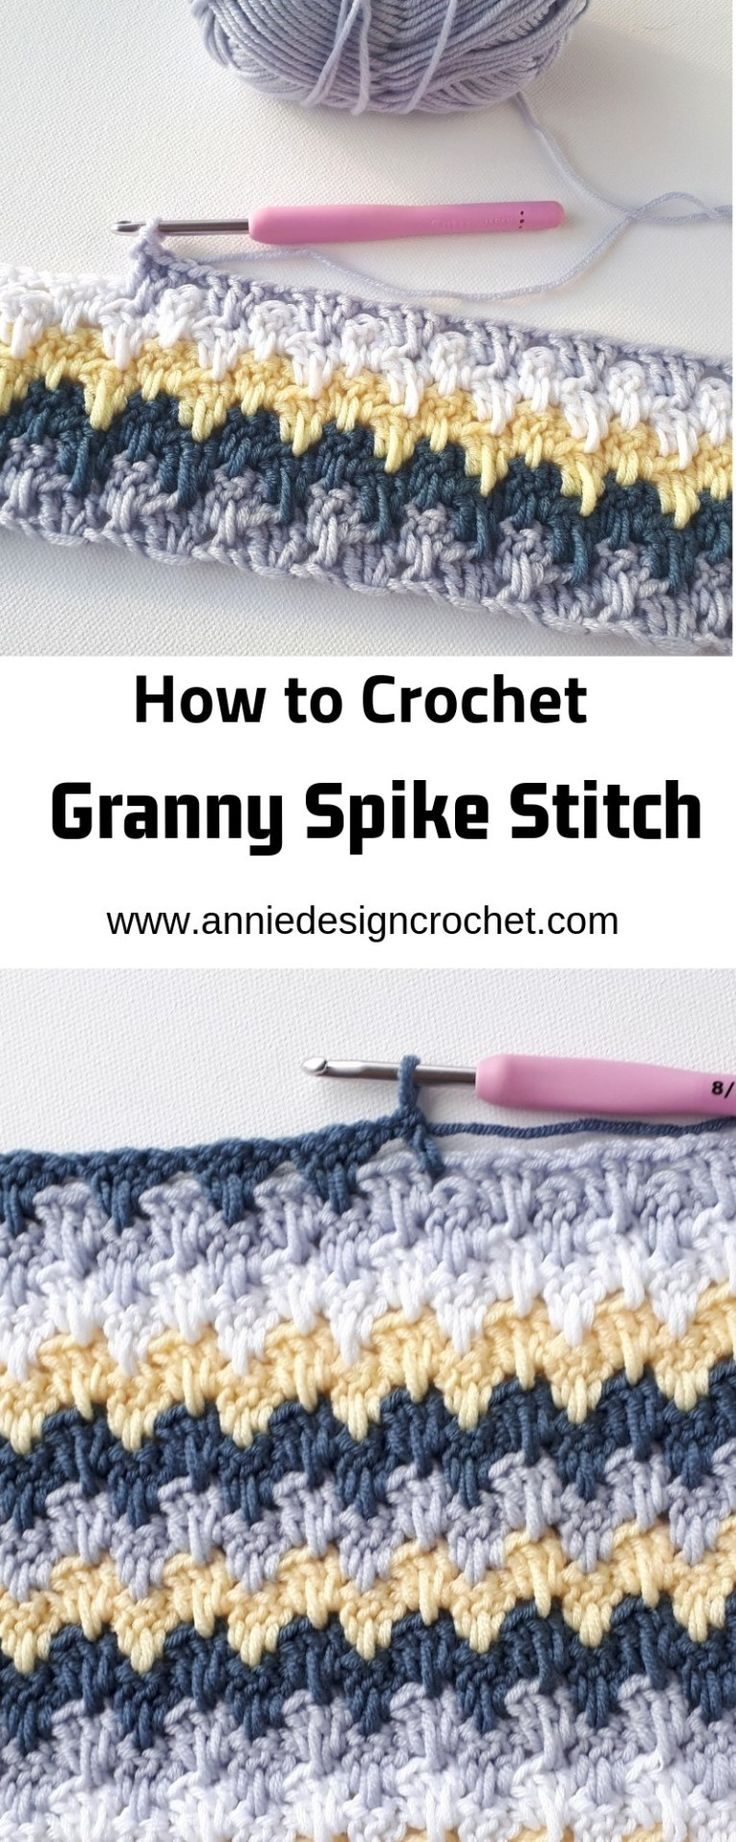 step by step crochet stitch tutorial for granny